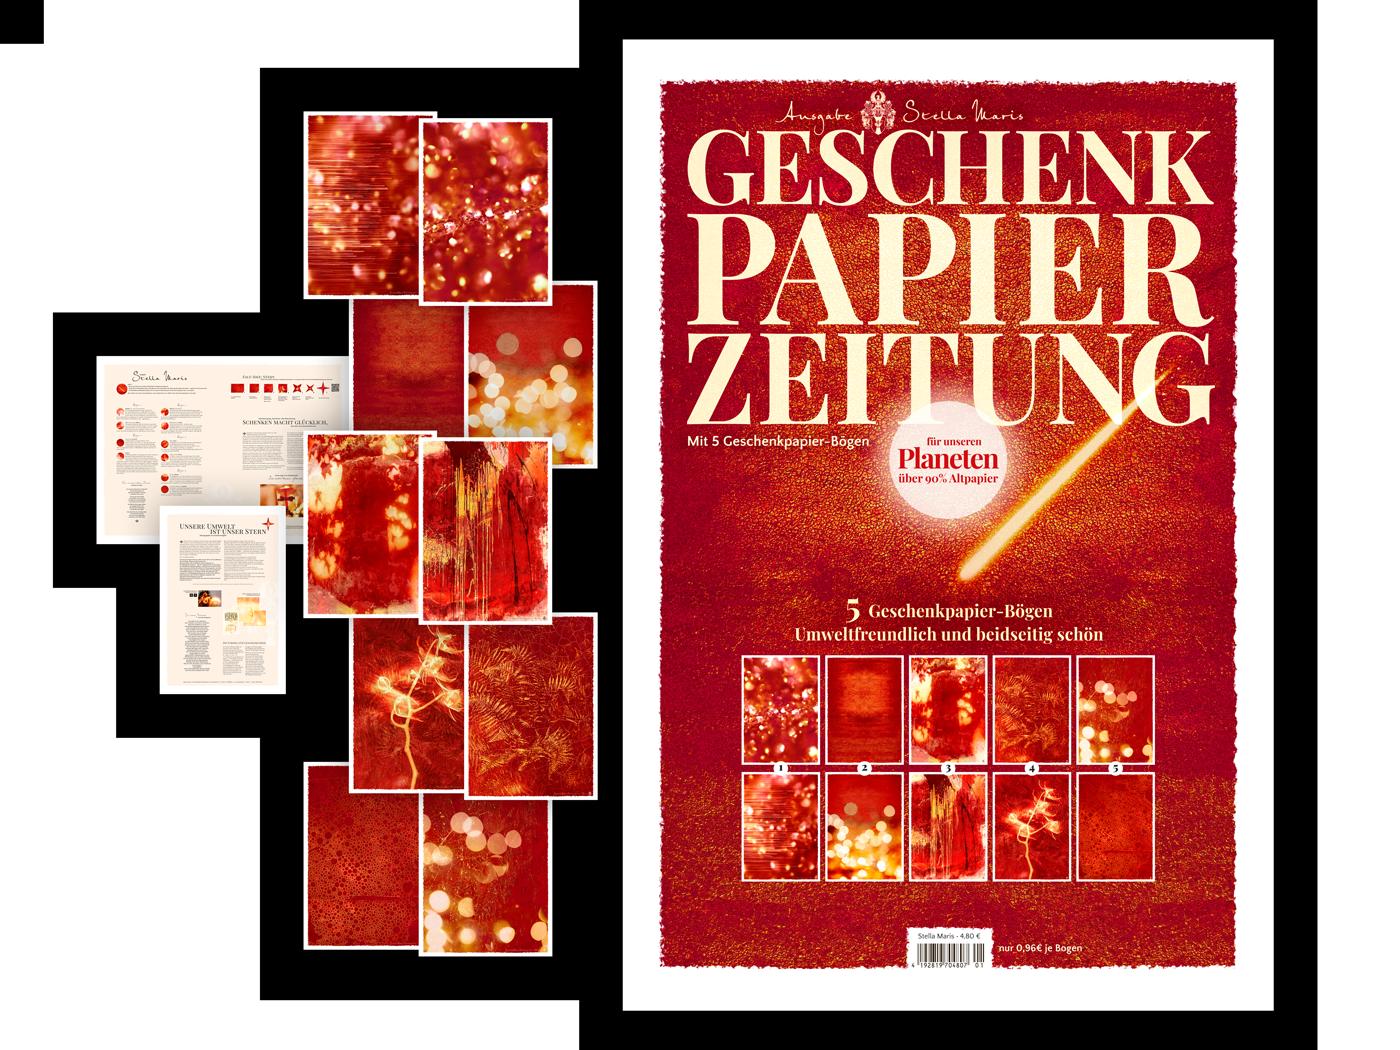 Geschenkpapier-Zeitung